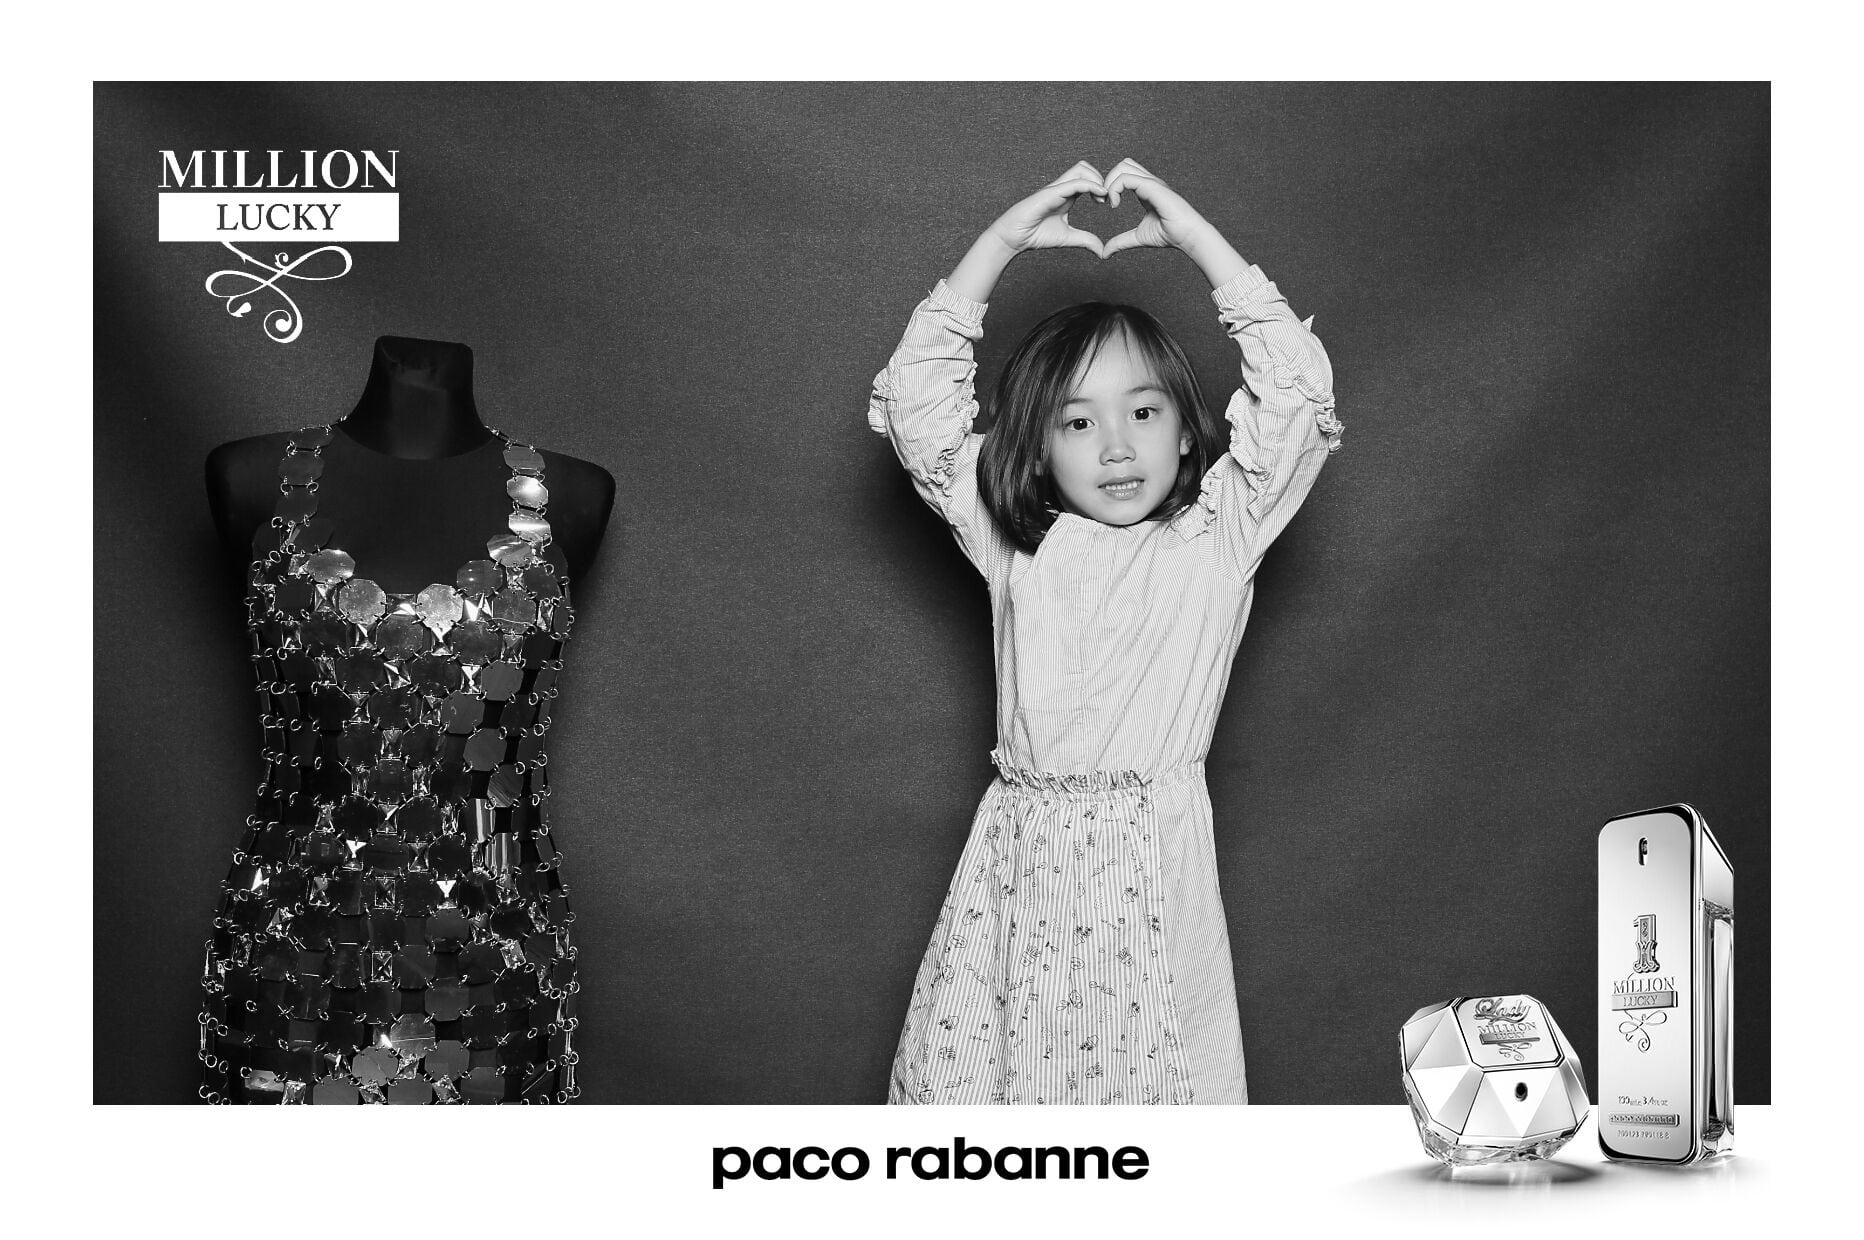 fotokoutek-paco-rabanne-million-lucky-14-9-2018-487304